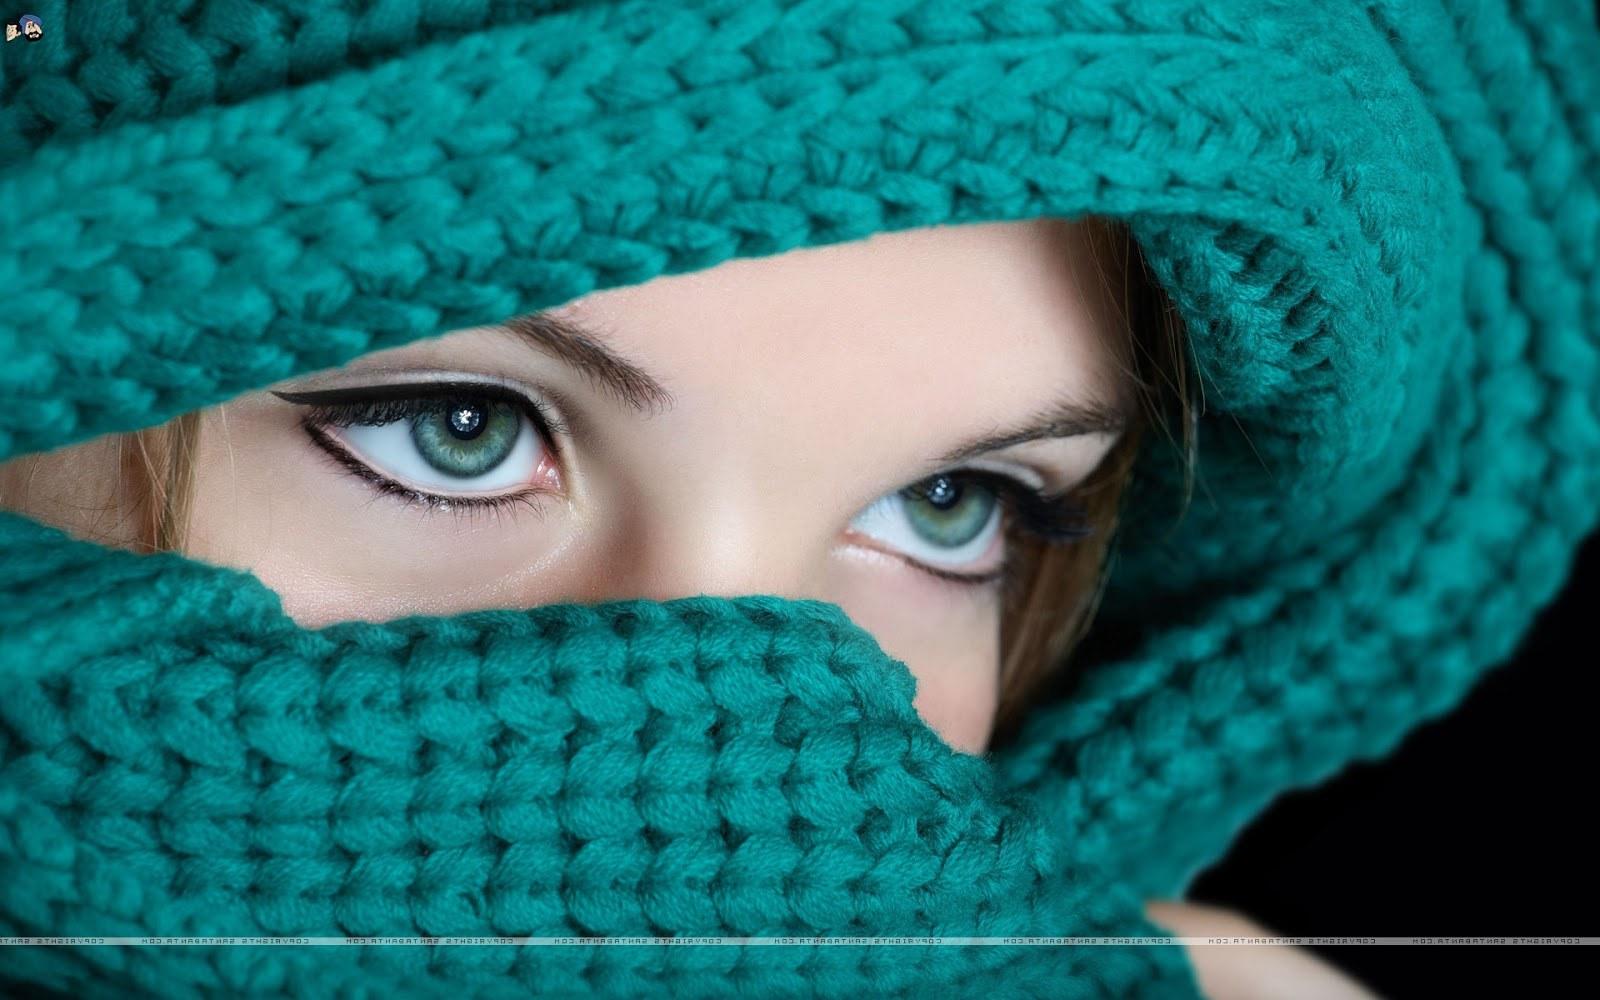 Design Muslimah Bercadar Memanah Zwd9 Koleksi Wallpaper Wanita Muslimah Bercadar